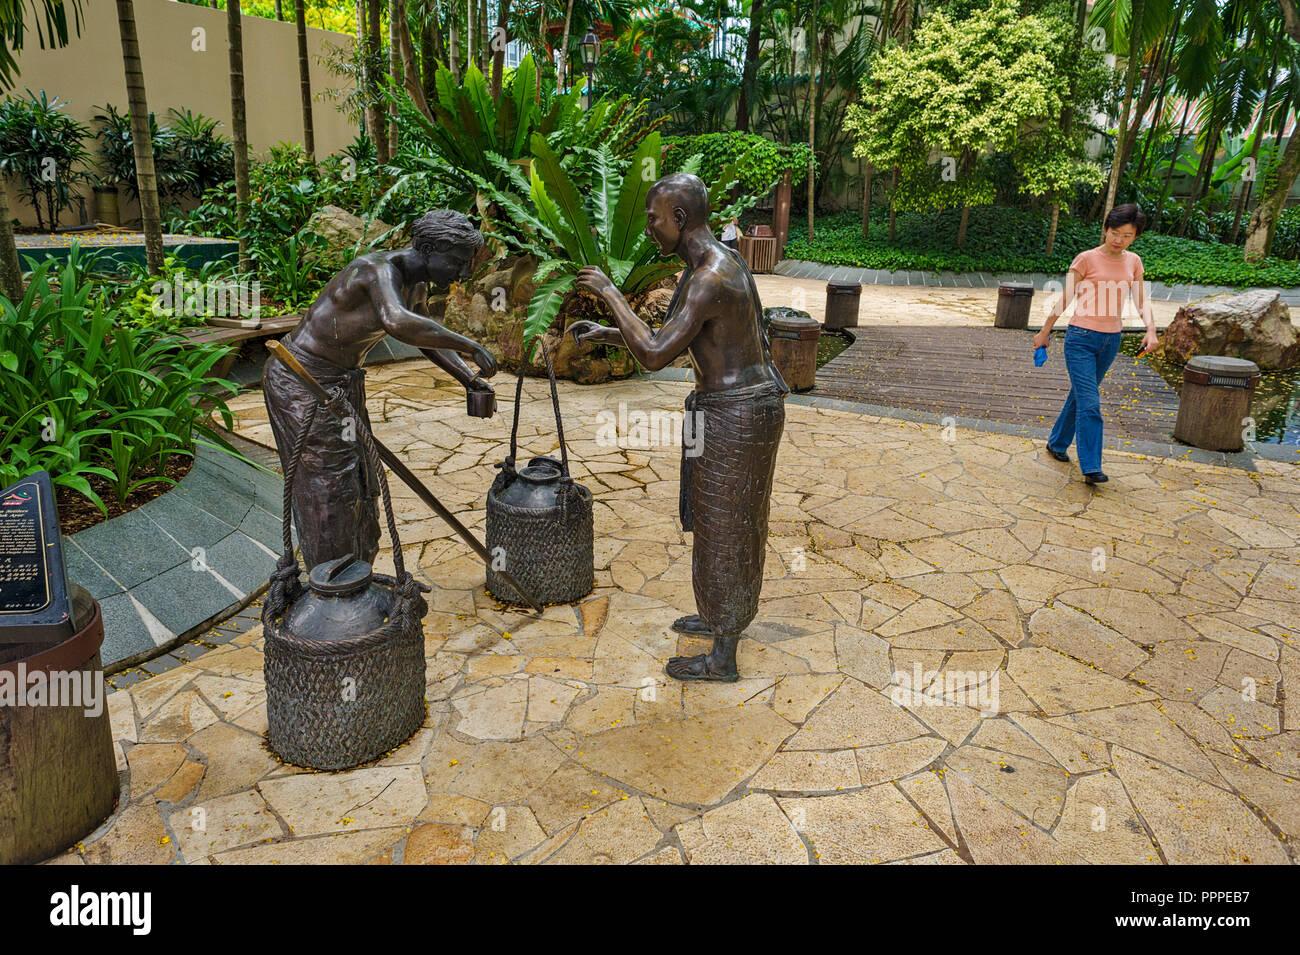 Singapore, Indian Settlers of Telok Ayer, Telok Ayer Street, masterpieces of local sculptor Lim Leong Seng - Stock Image